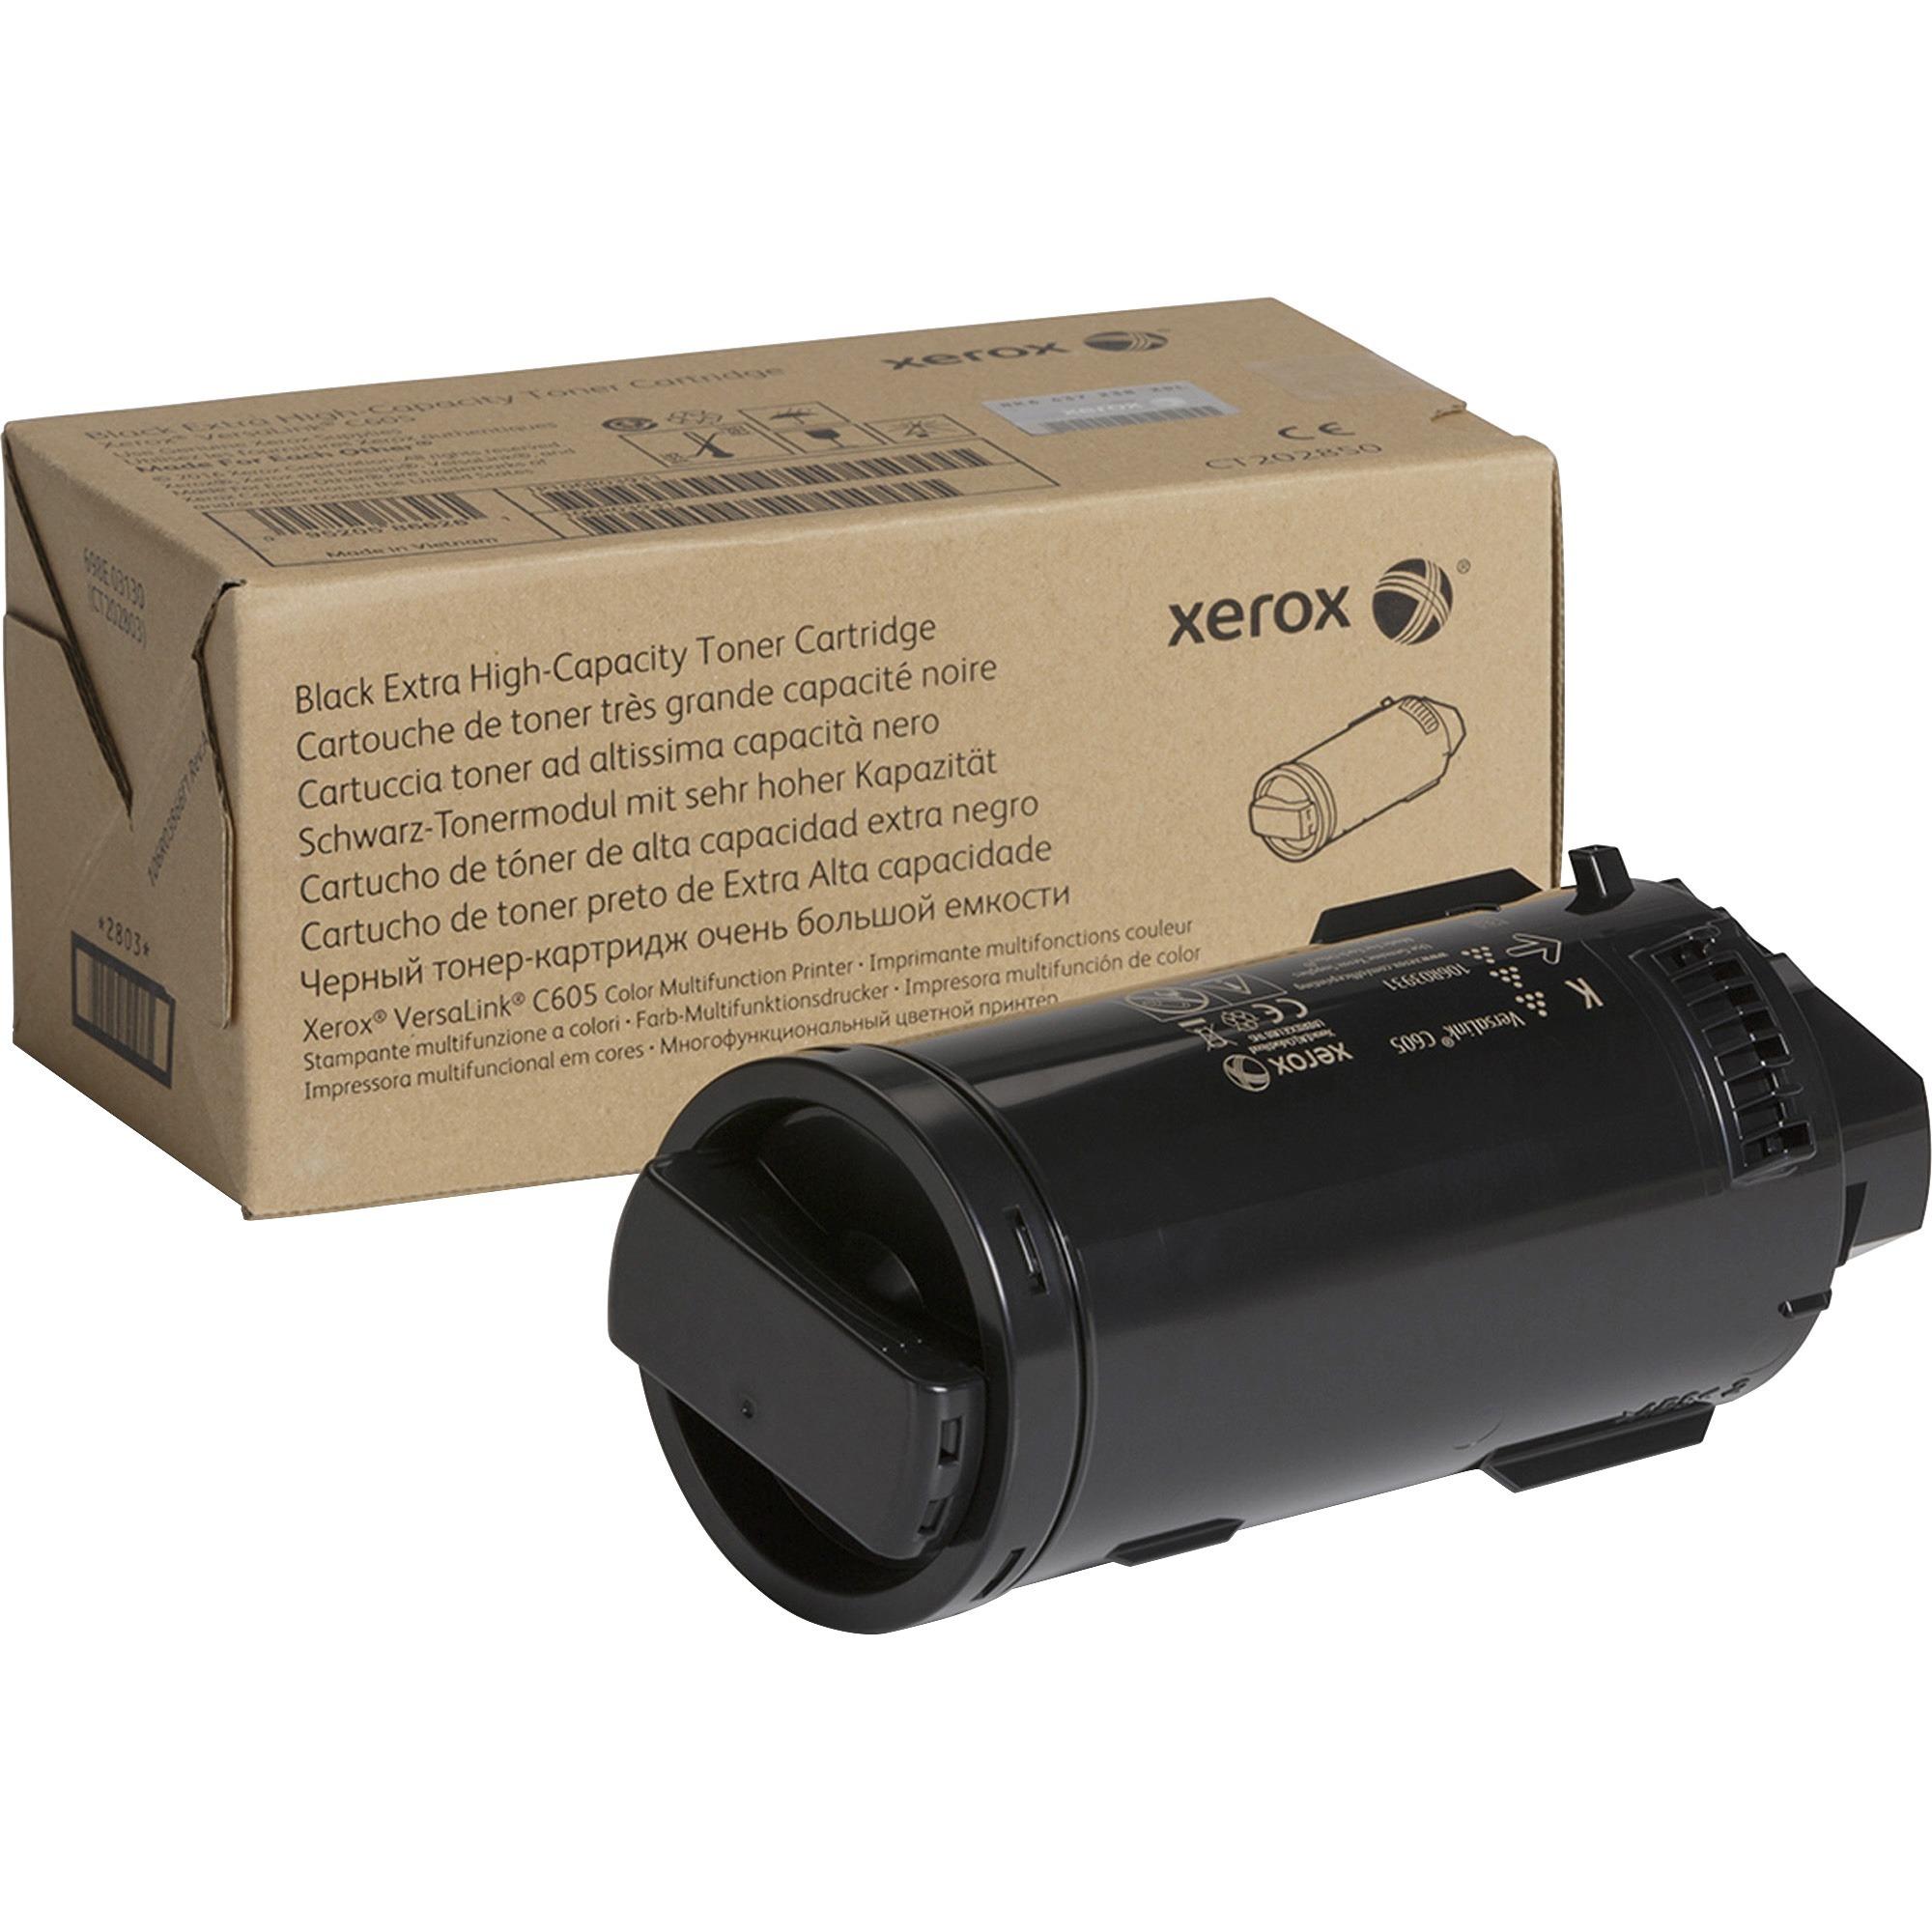 Xerox Genuine Black Extra High Capacity Toner Cartridge For The VersaLink C605